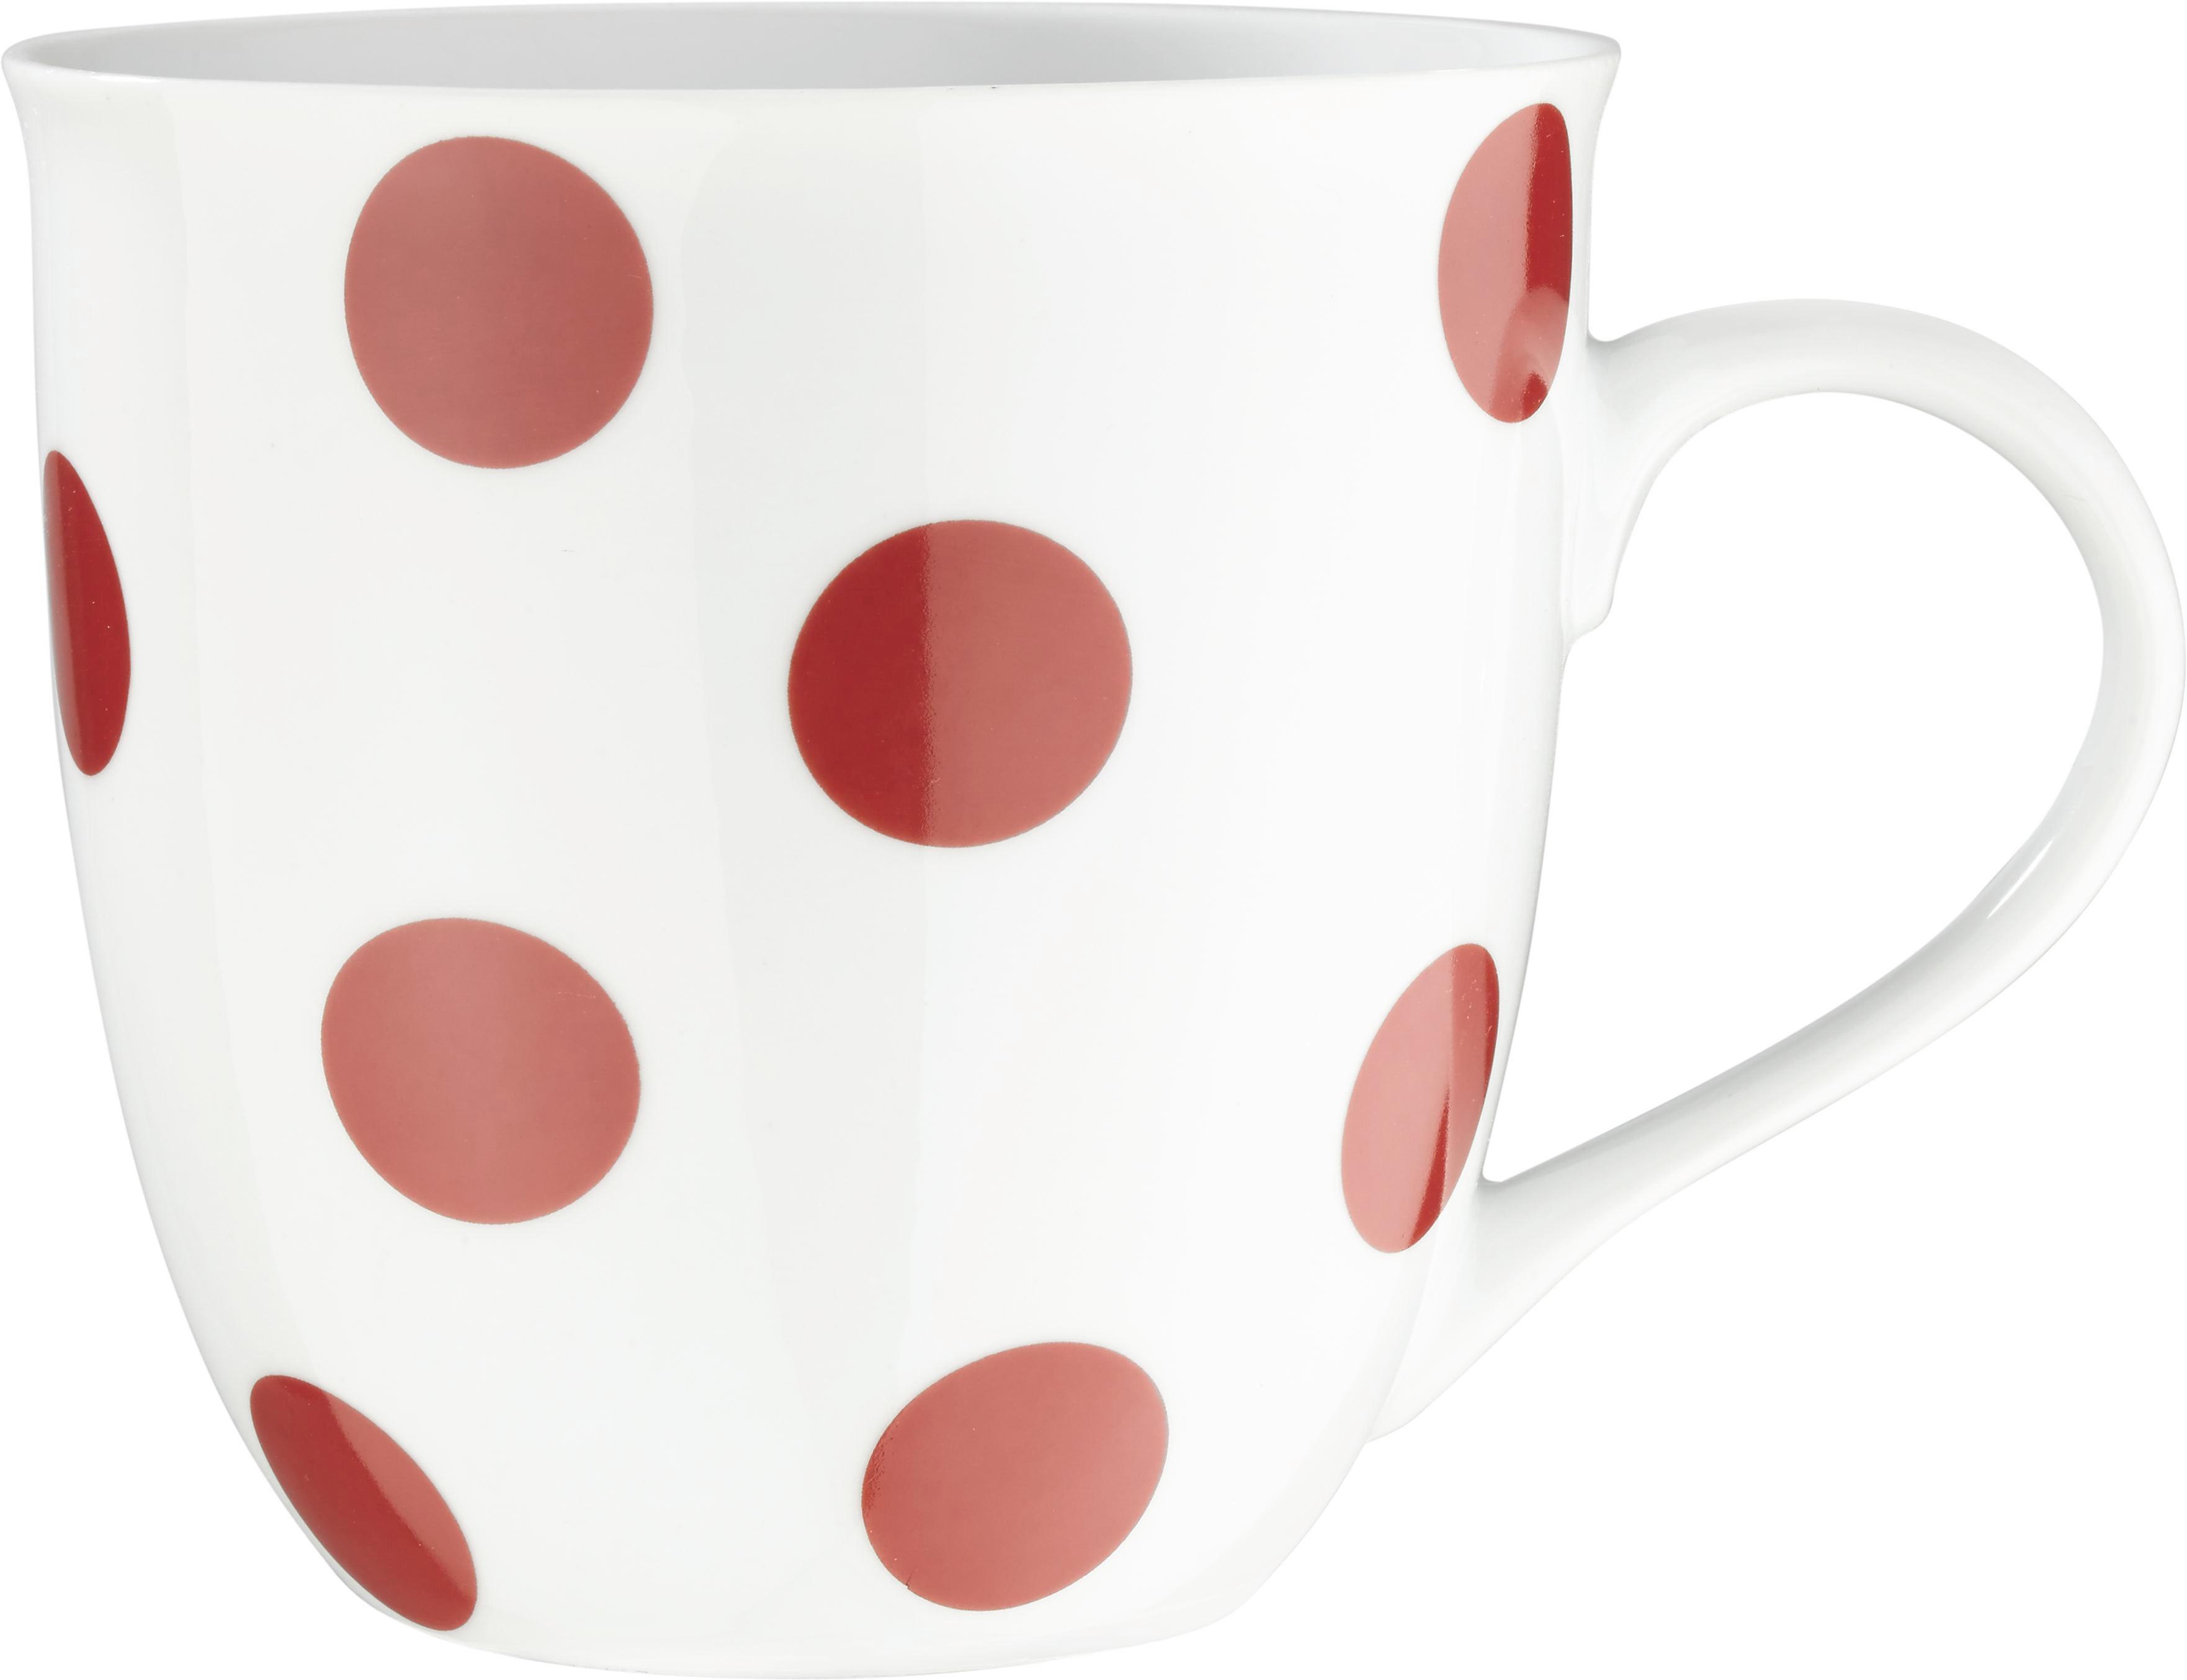 Velika Skodelica Pongo - rdeča/siva, Konvencionalno, keramika - MÖMAX modern living